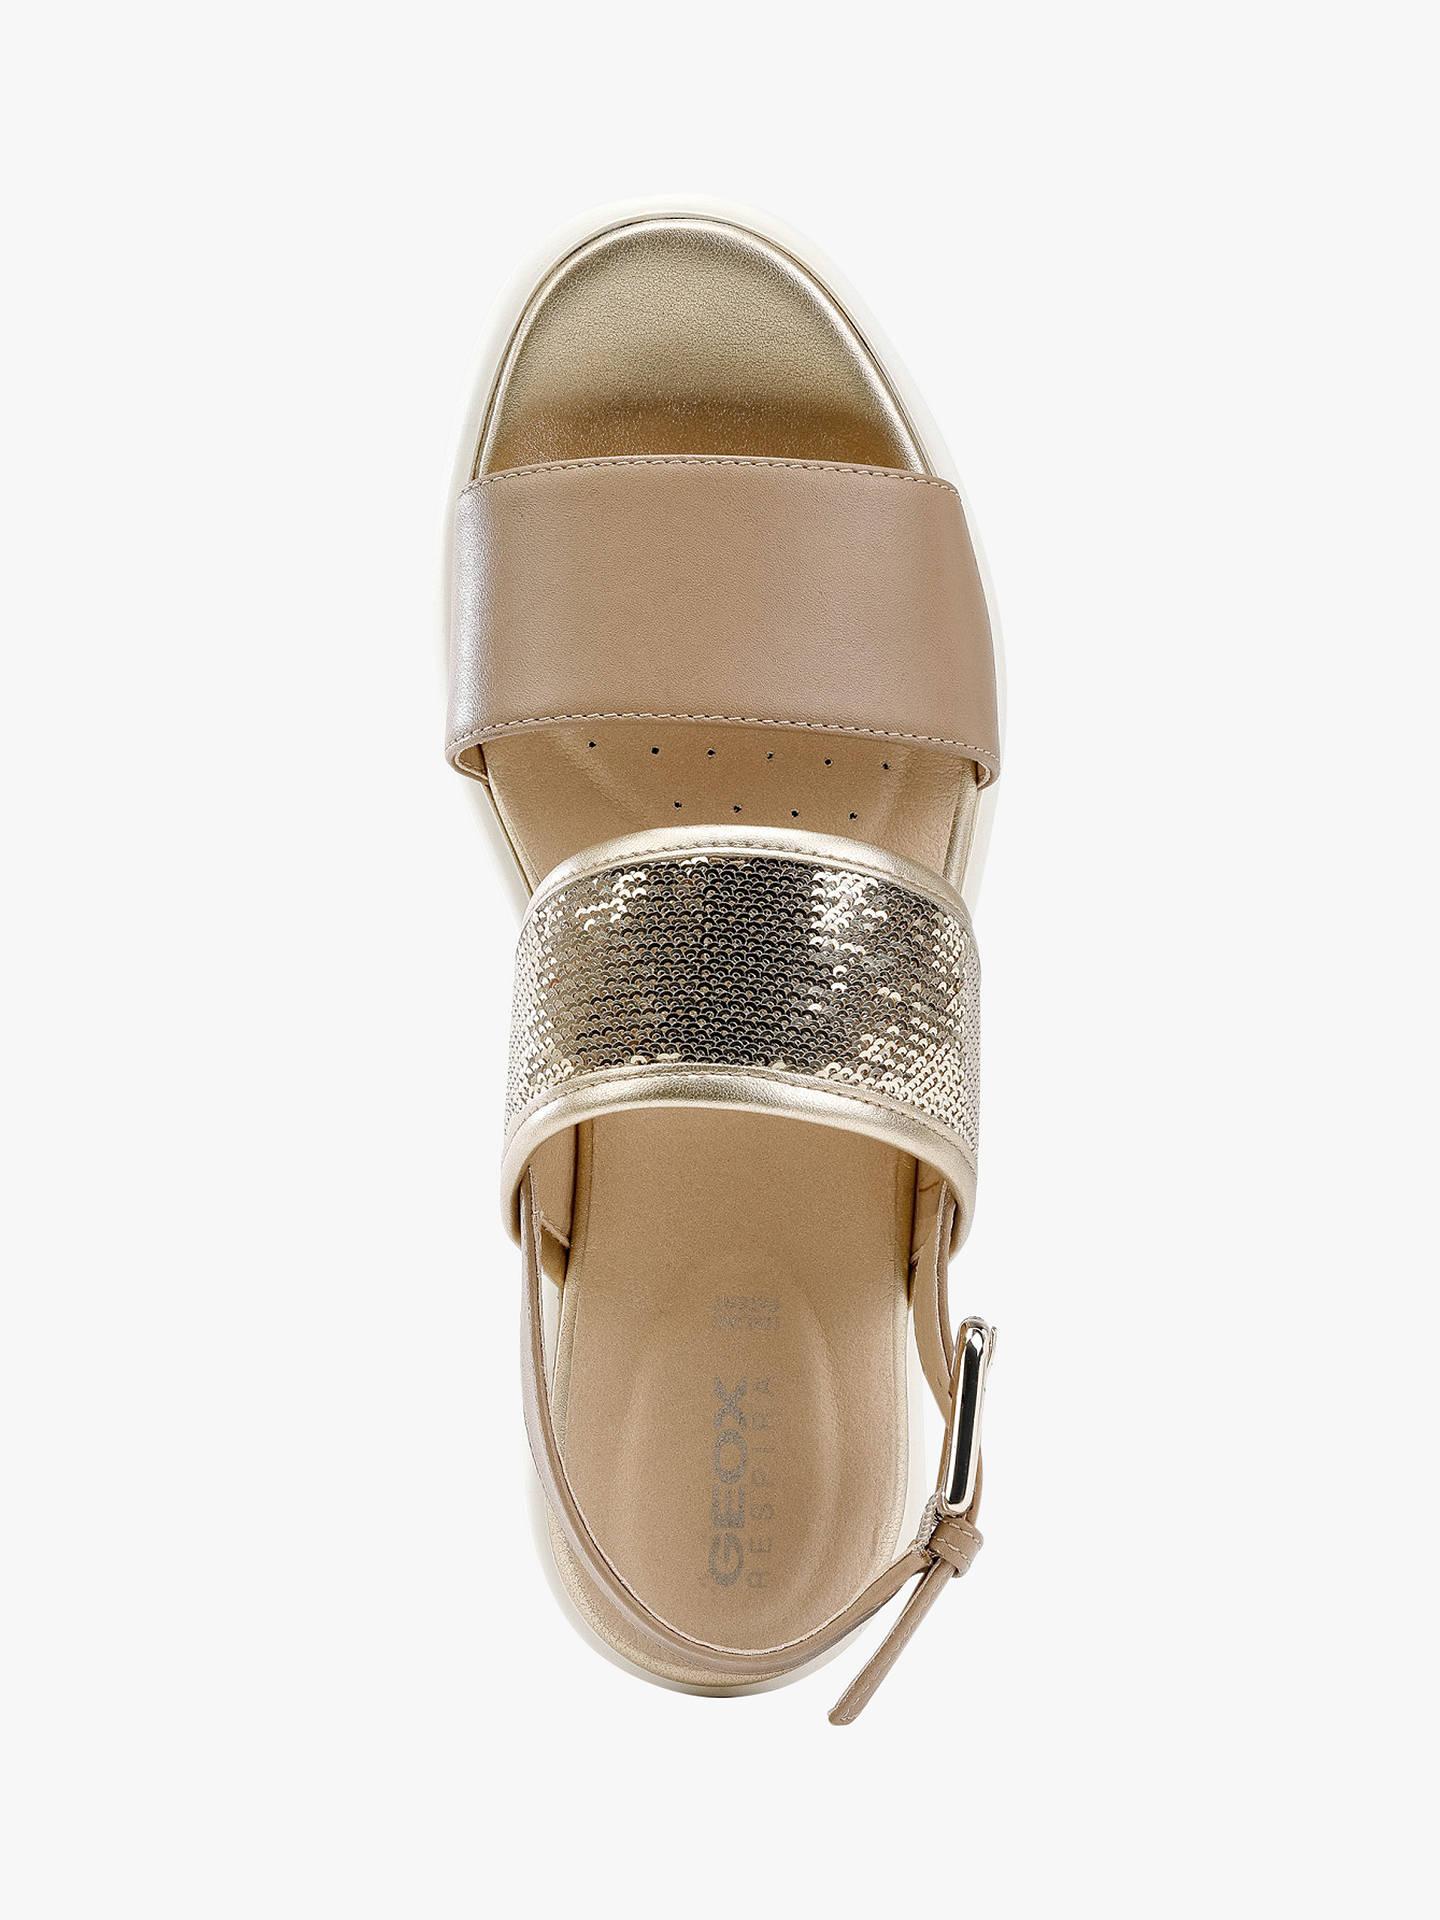 best cheap a602d 2eade Geox D Wimbley Double Strap Sandals, Taupe/Light Gold at ...